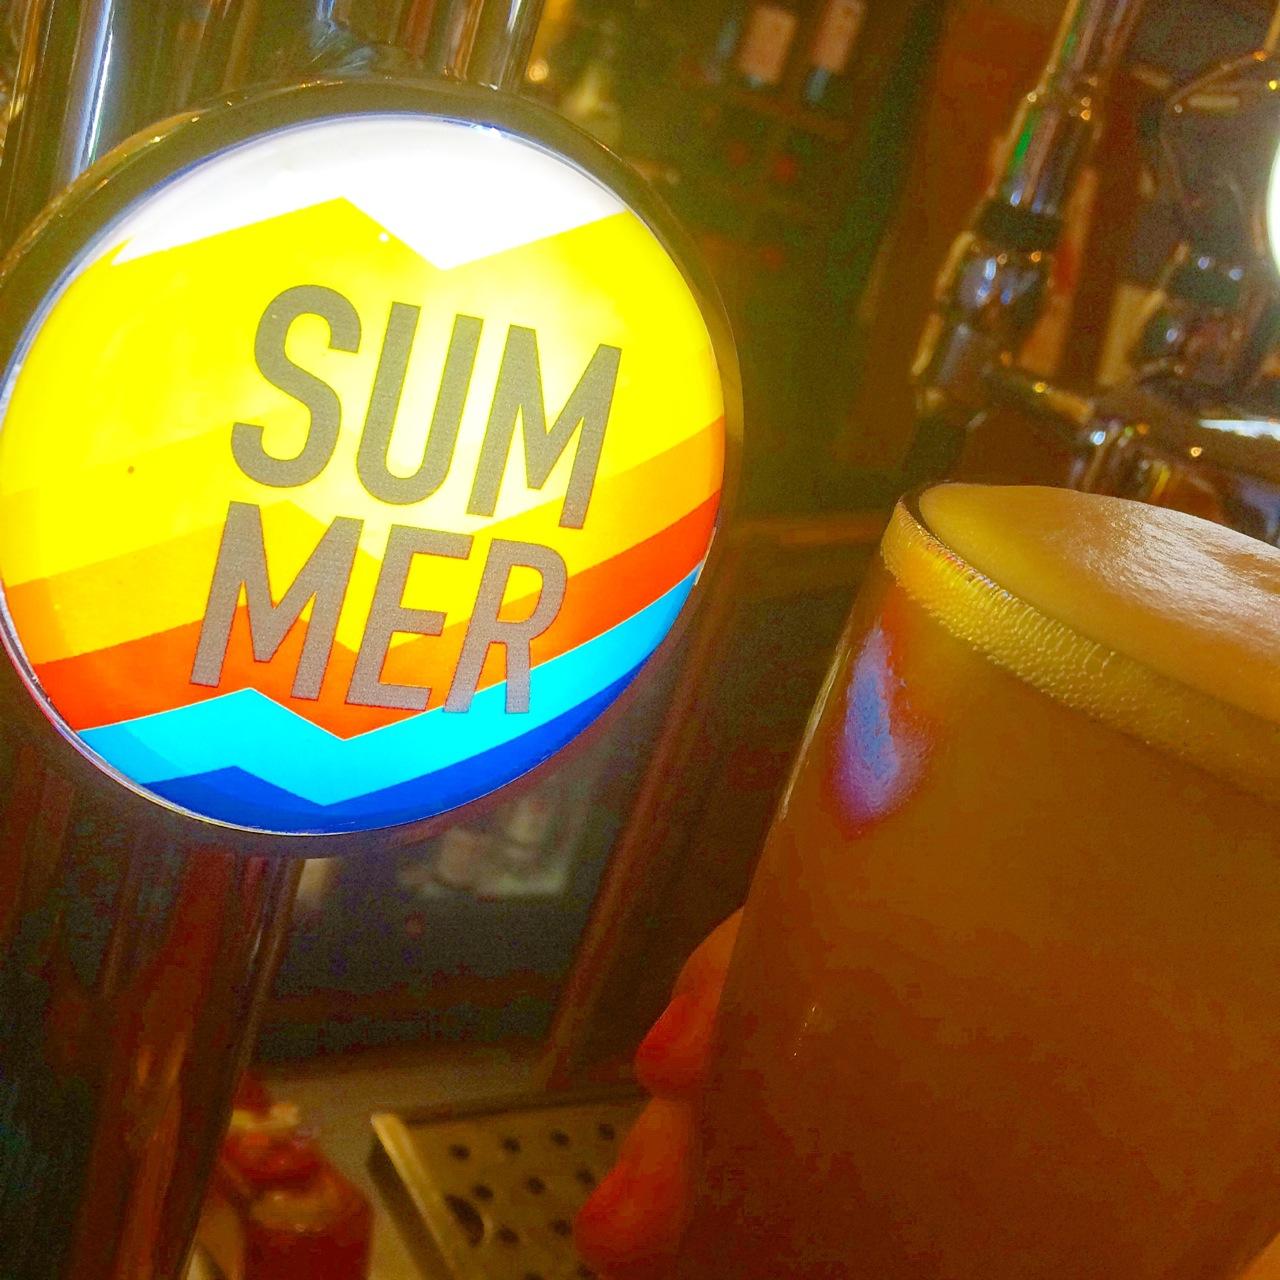 https://i2.wp.com/fatgayvegan.com/wp-content/uploads/2015/07/summer-beer-and-union.jpg?fit=1280%2C1280